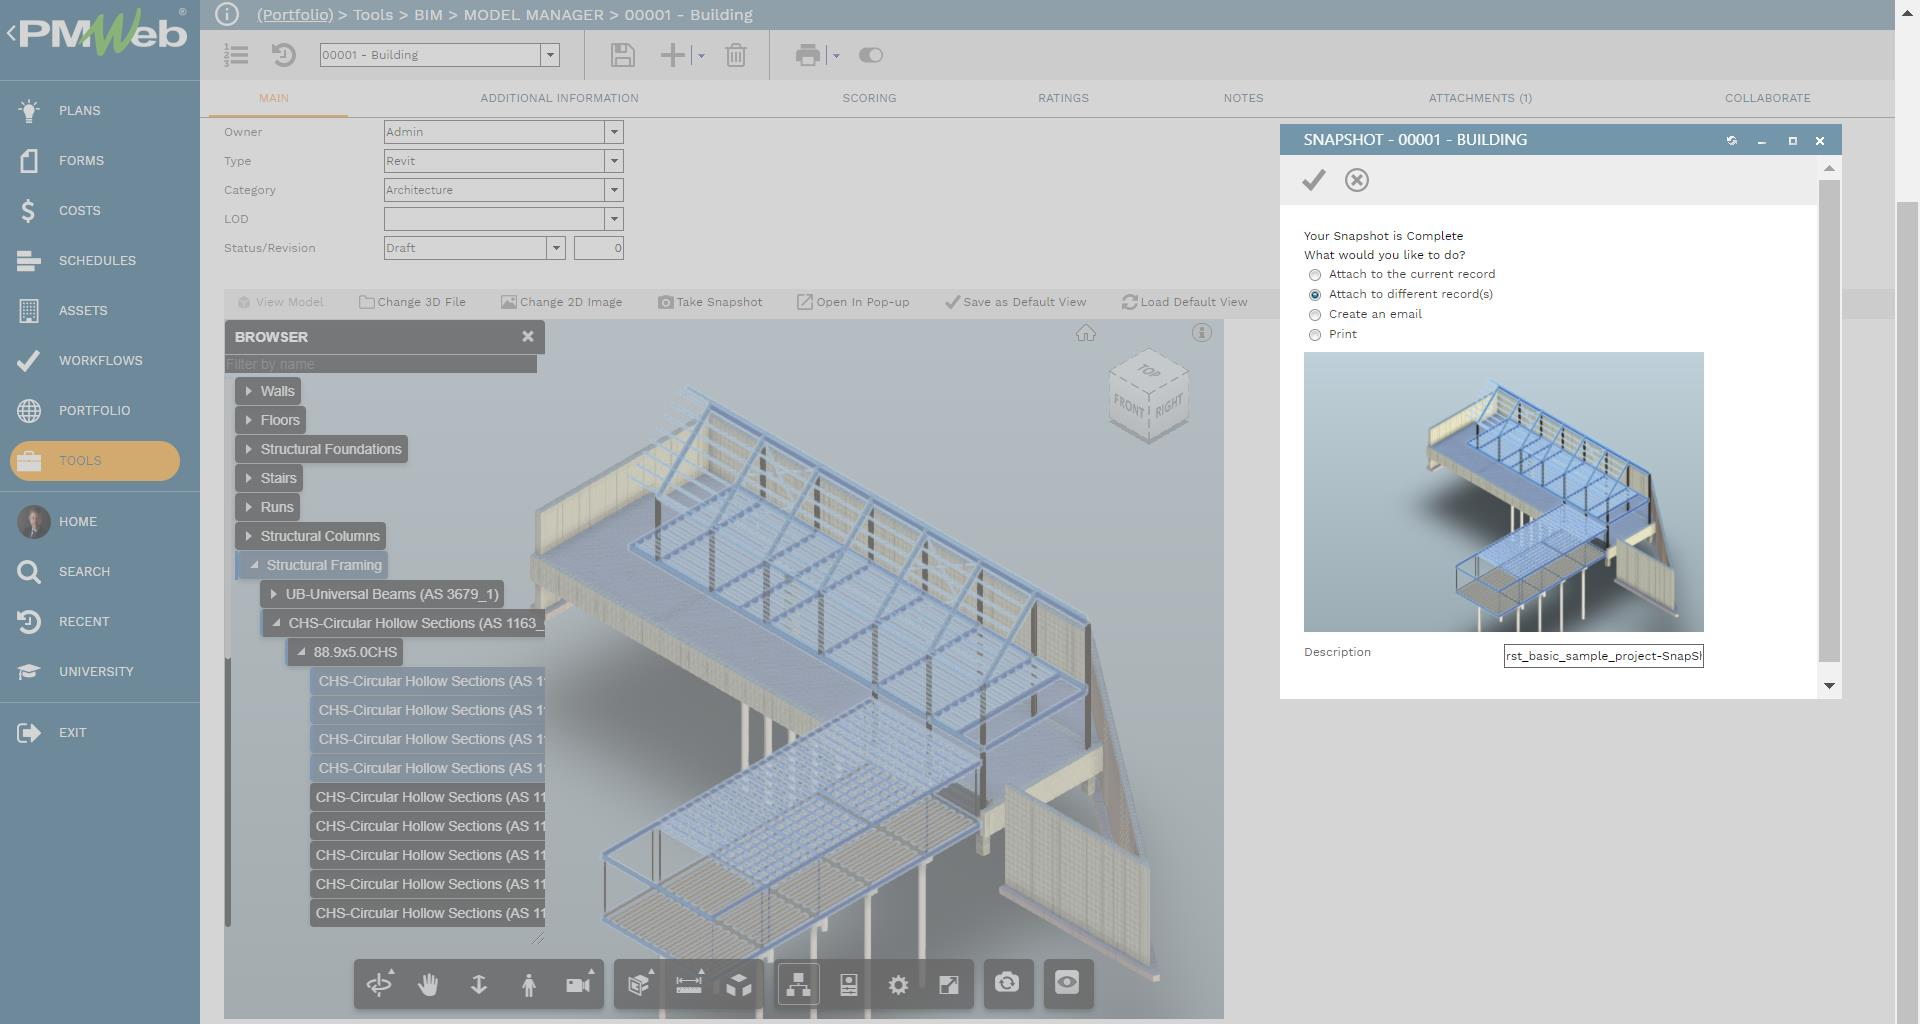 PMWeb 7 Tools BIM Model Manager Building Main Snapshot Building